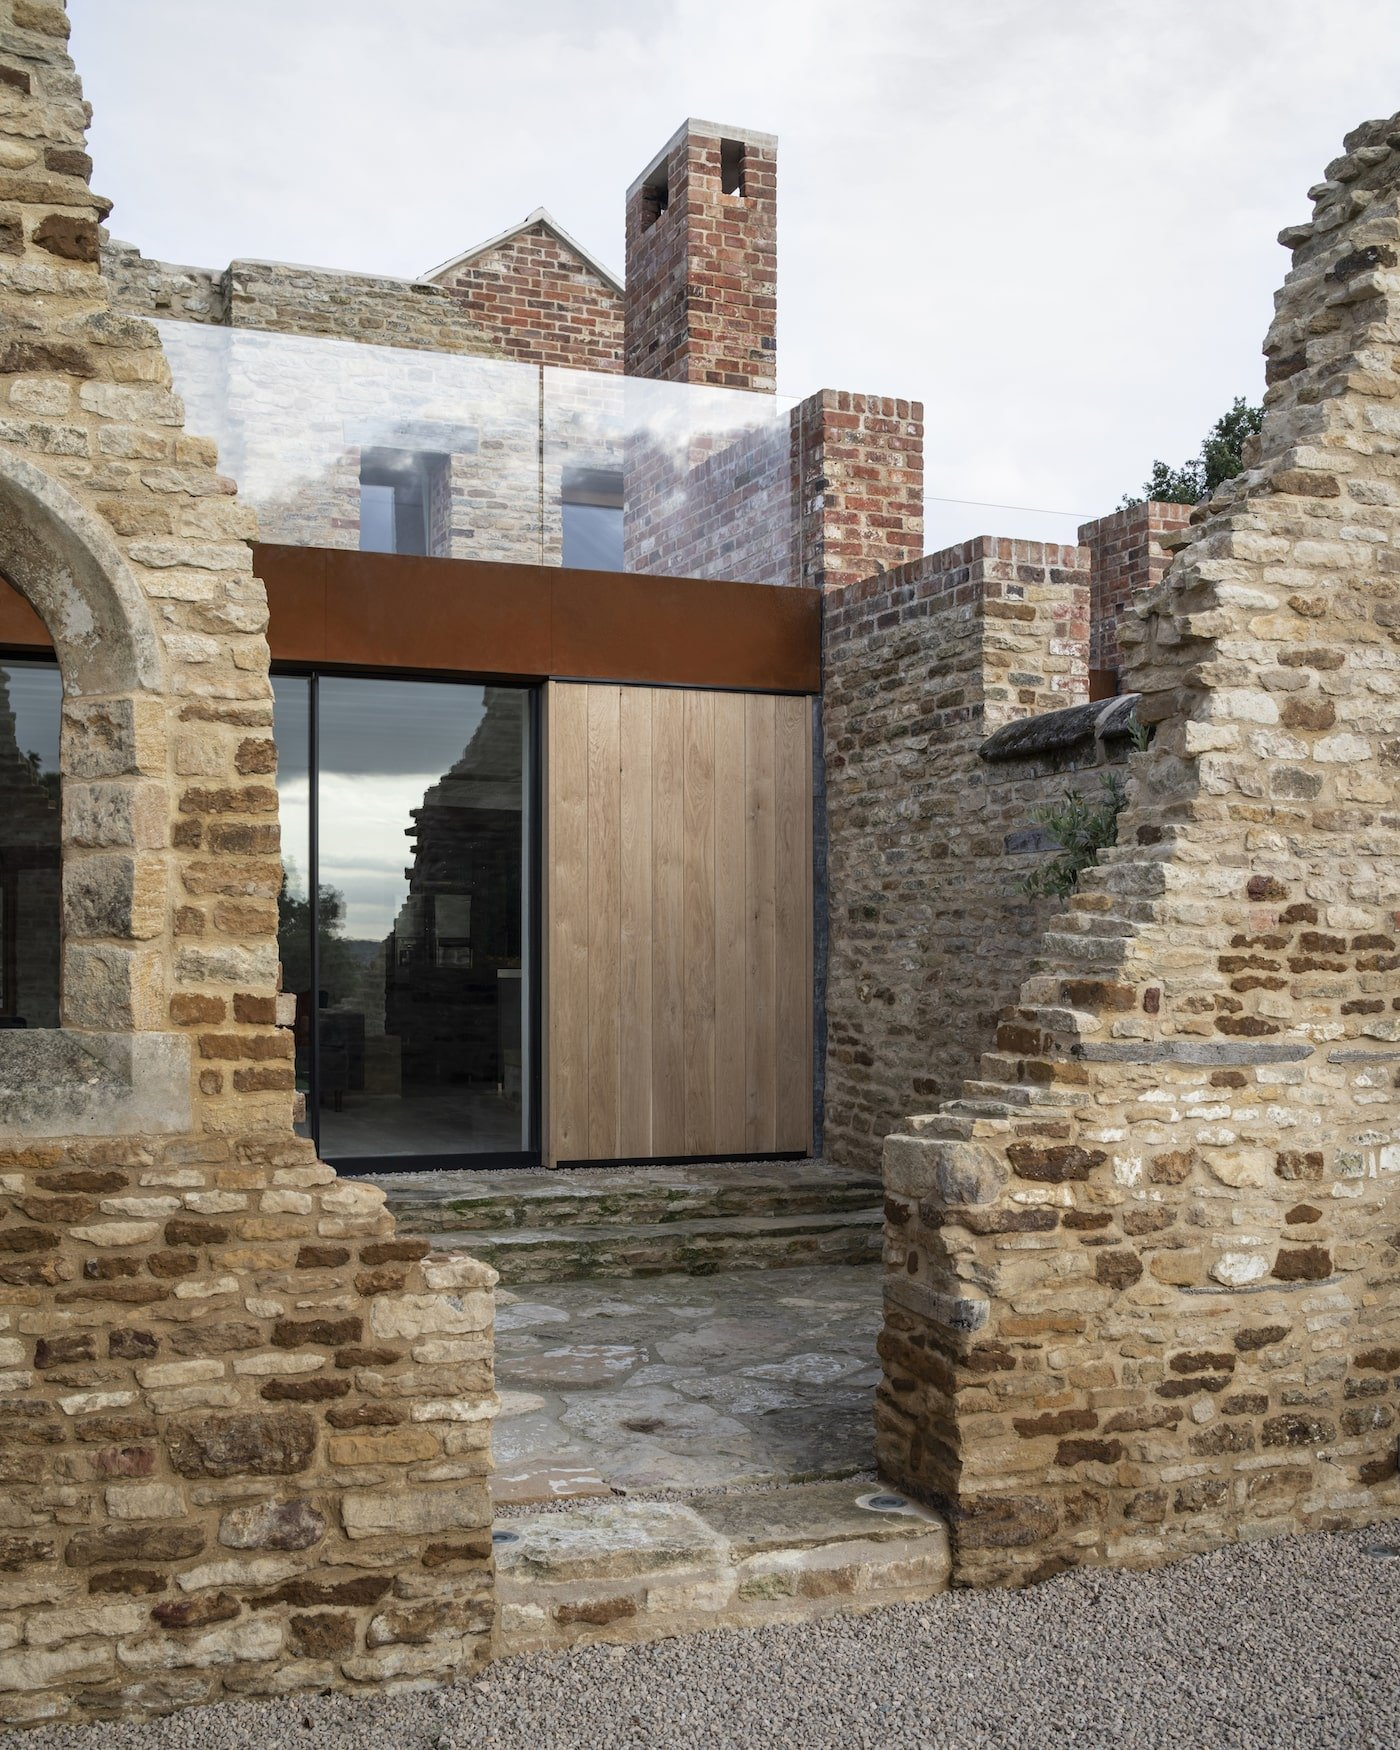 Adaptive reuse renovation with recycled bricks